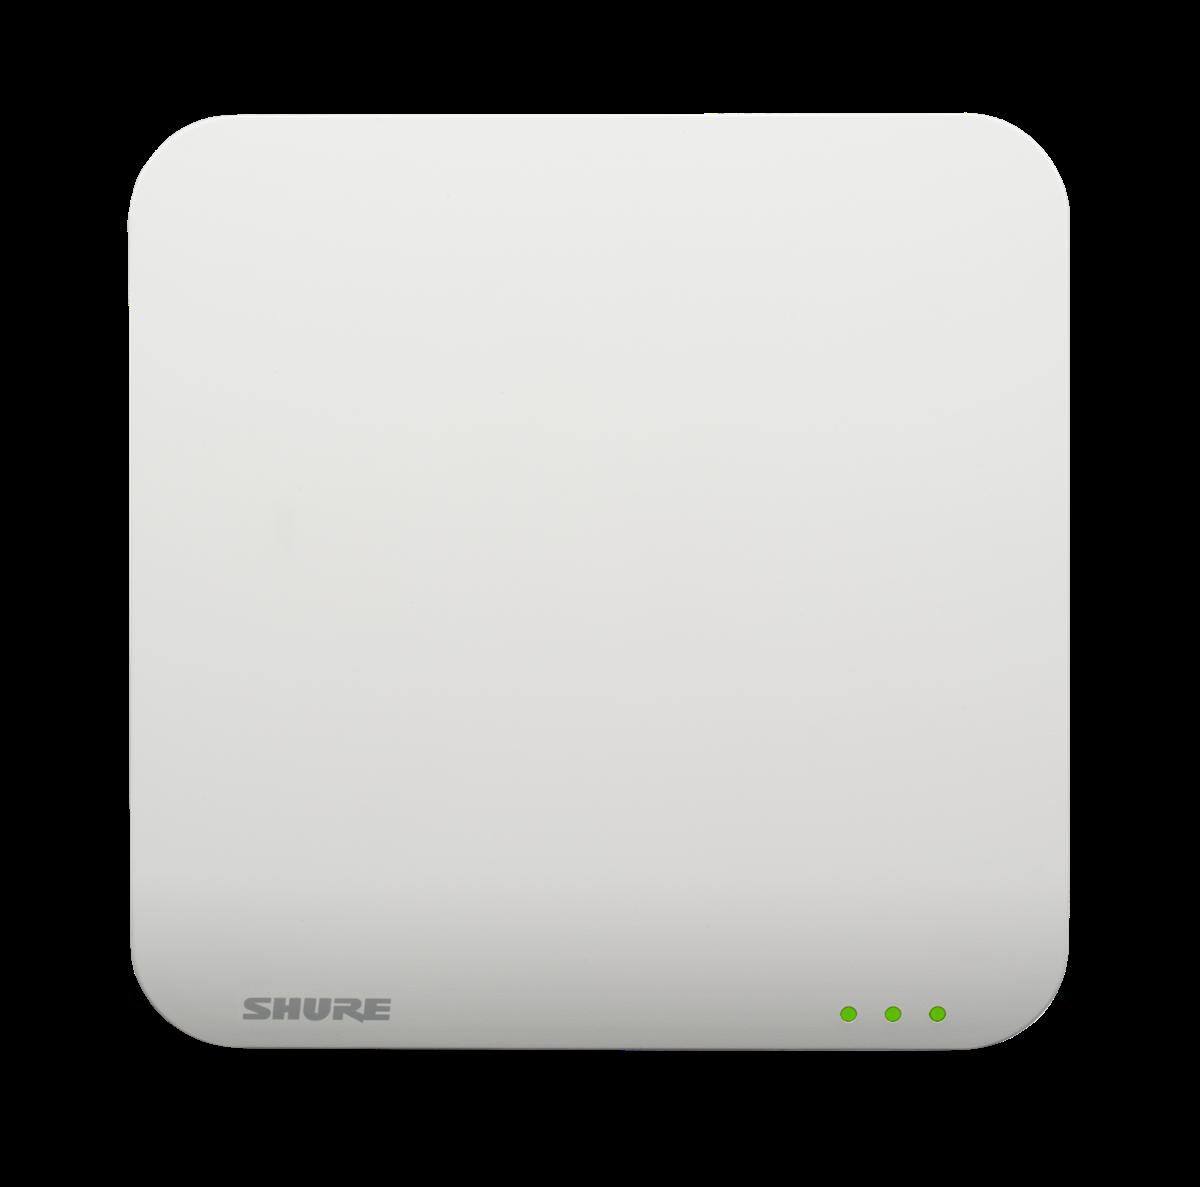 Shure MXWAPT4 Microflex 4 ch access point transceicer